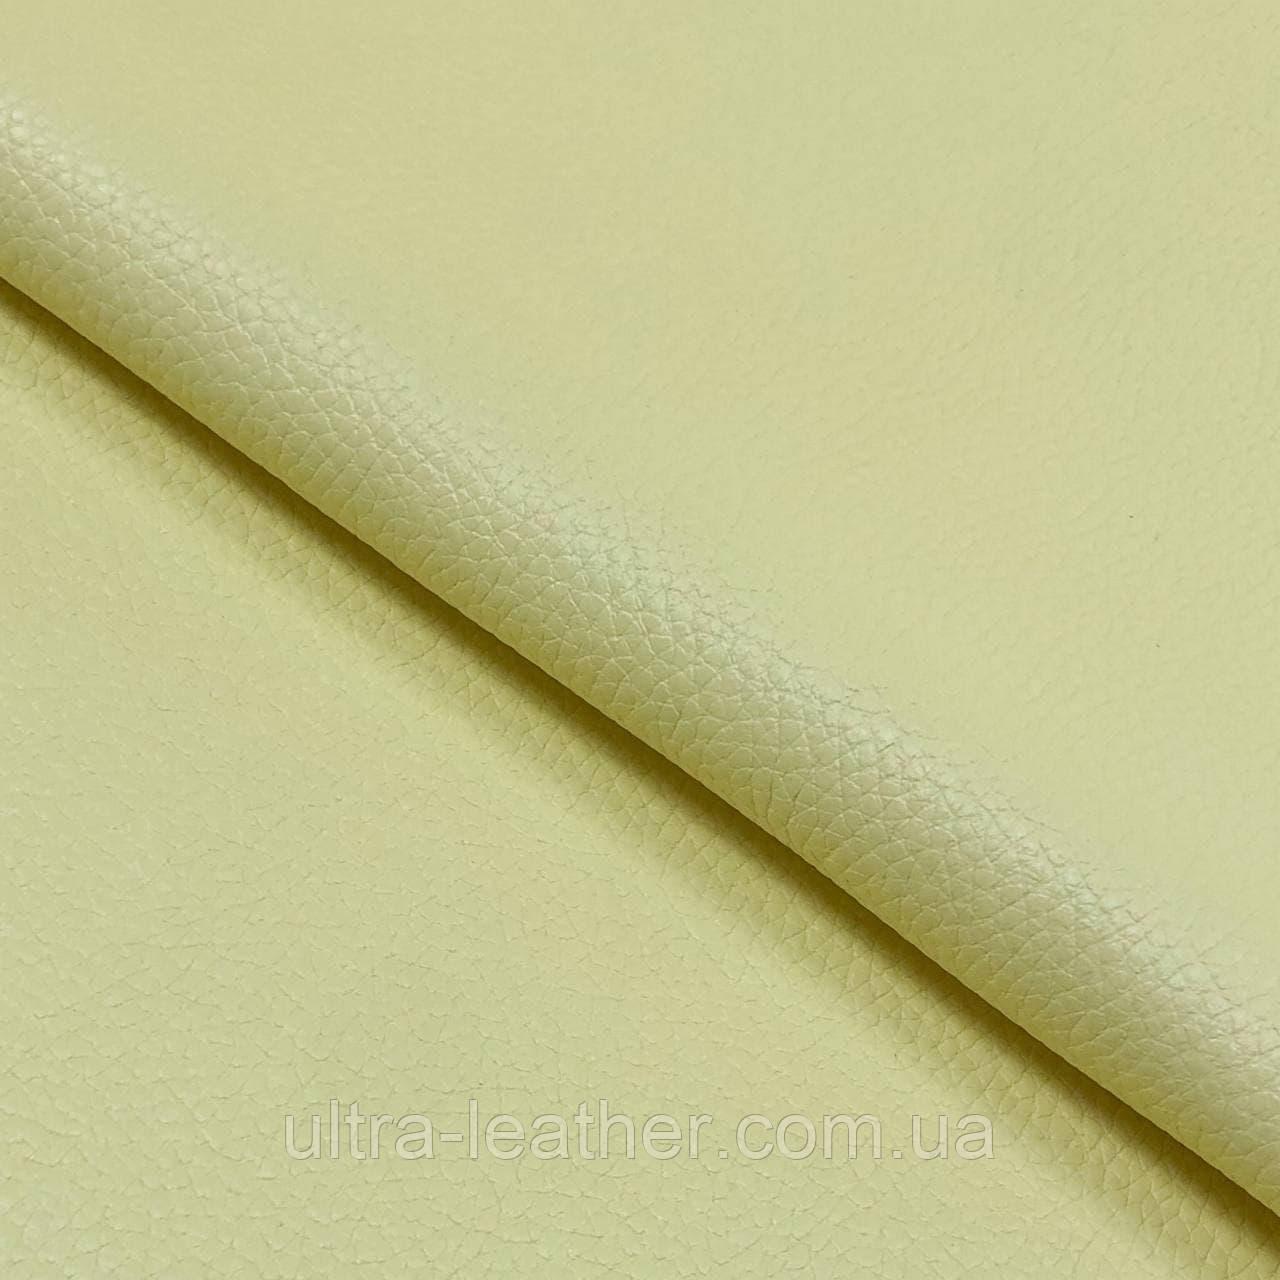 Натуральна шкіра галантерейна ФЛЕШ, Жовтий, Pantone 12-0824